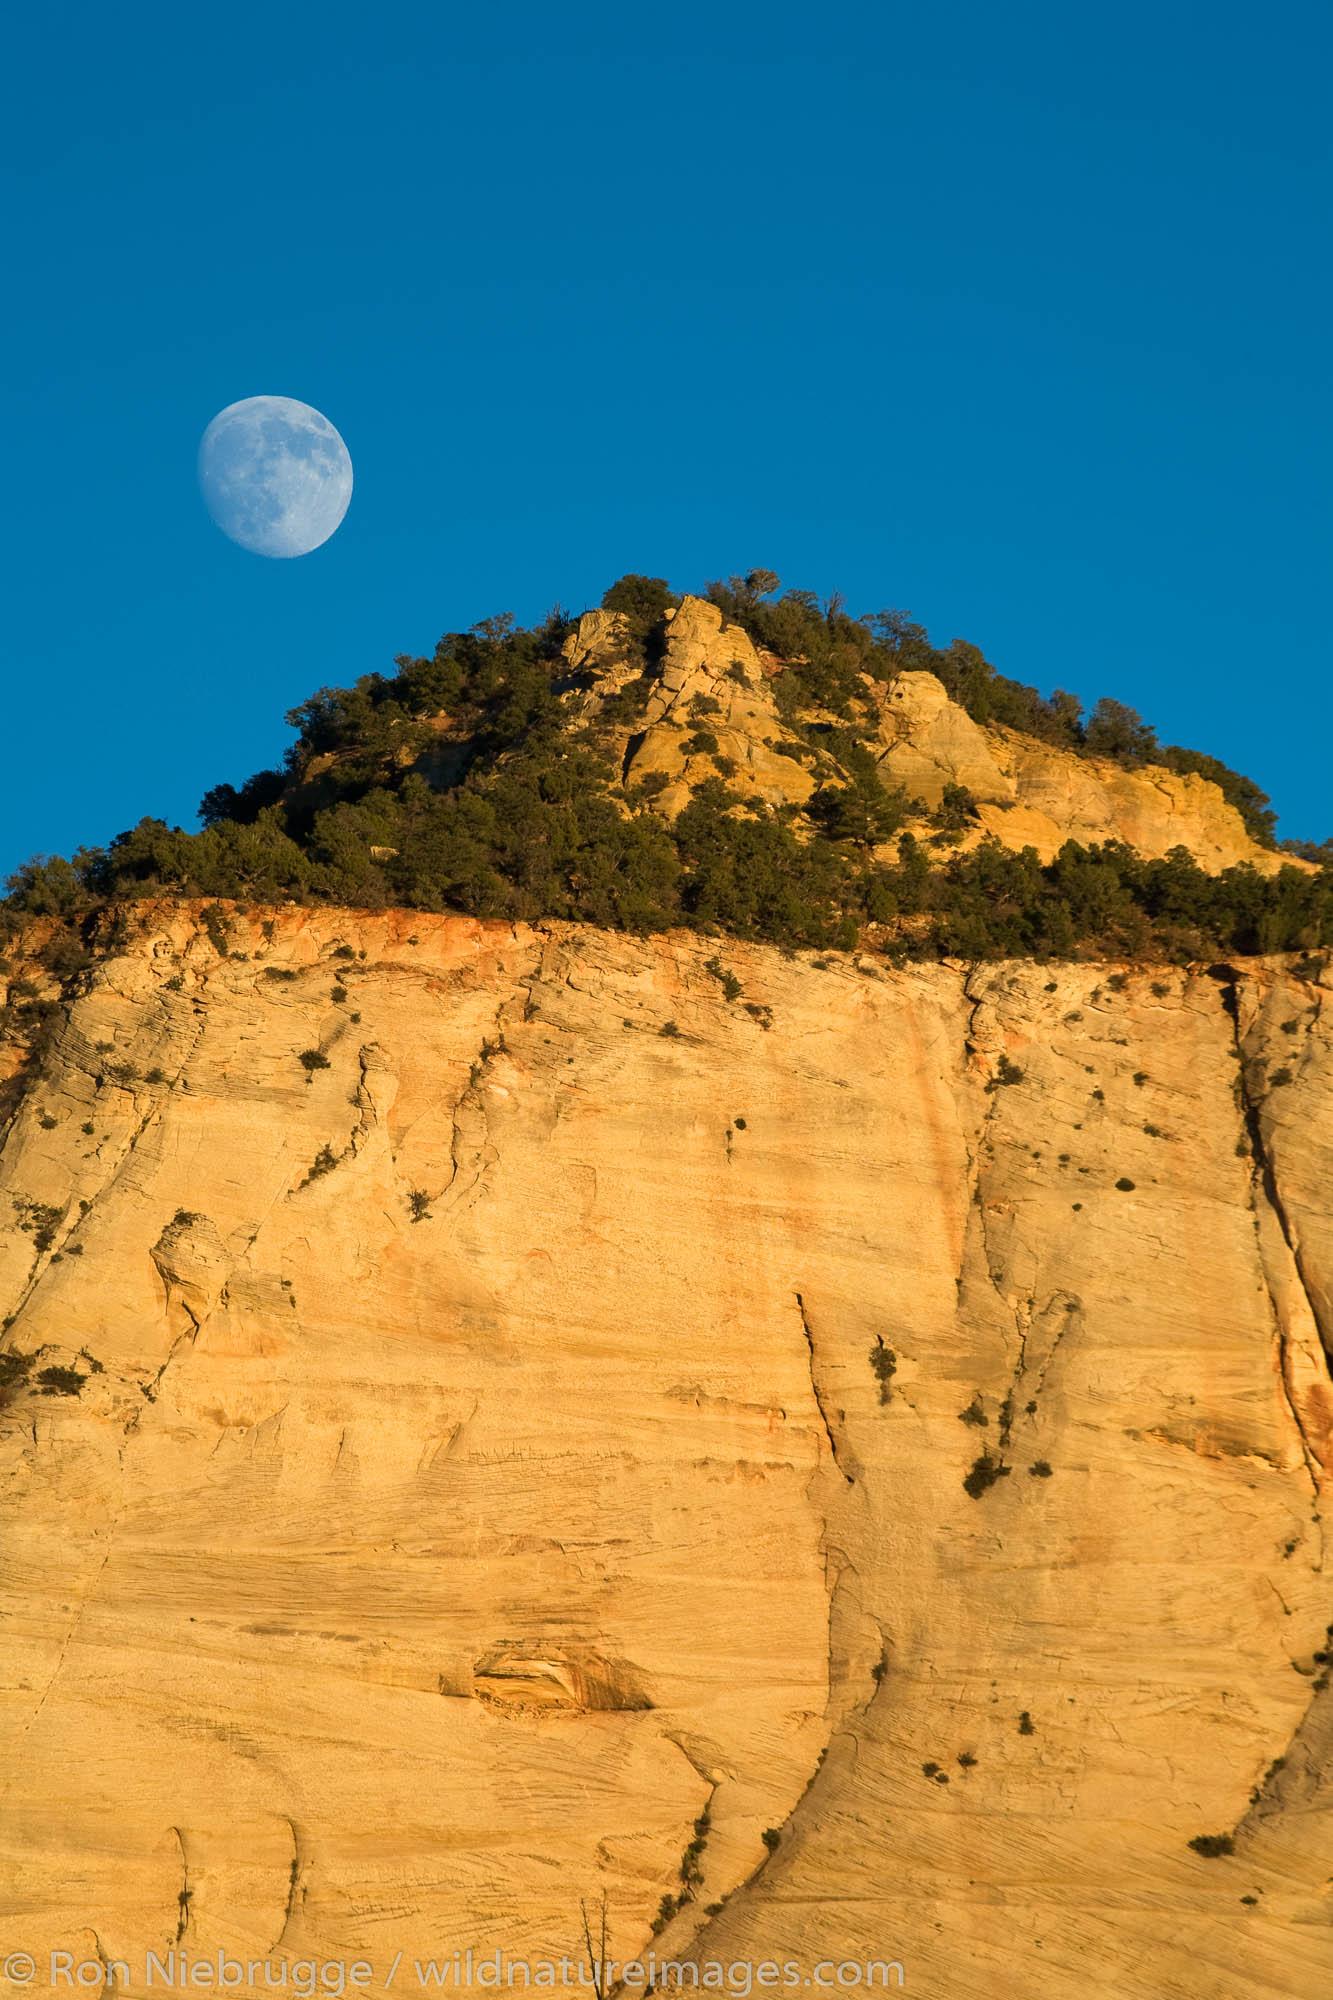 Full moon over Checkboard Mesa, Zion National Park, Utah.